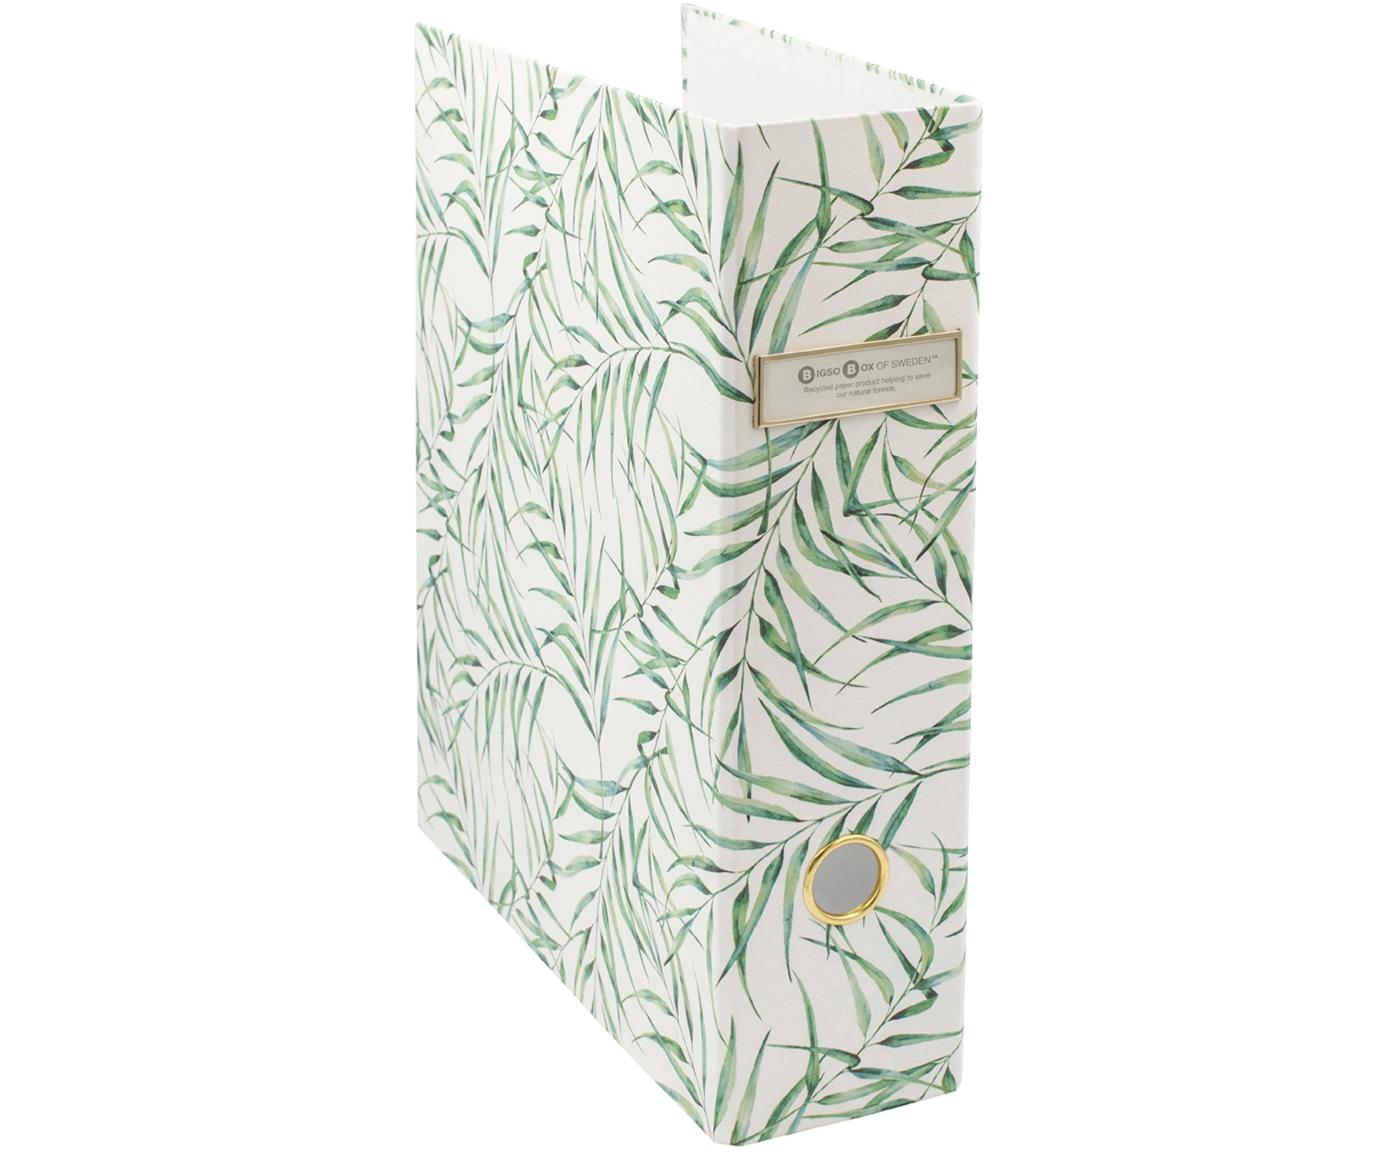 Cartella portadocumenti Breeze, Bianco, verde, Larg. 29 x Alt. 32 cm